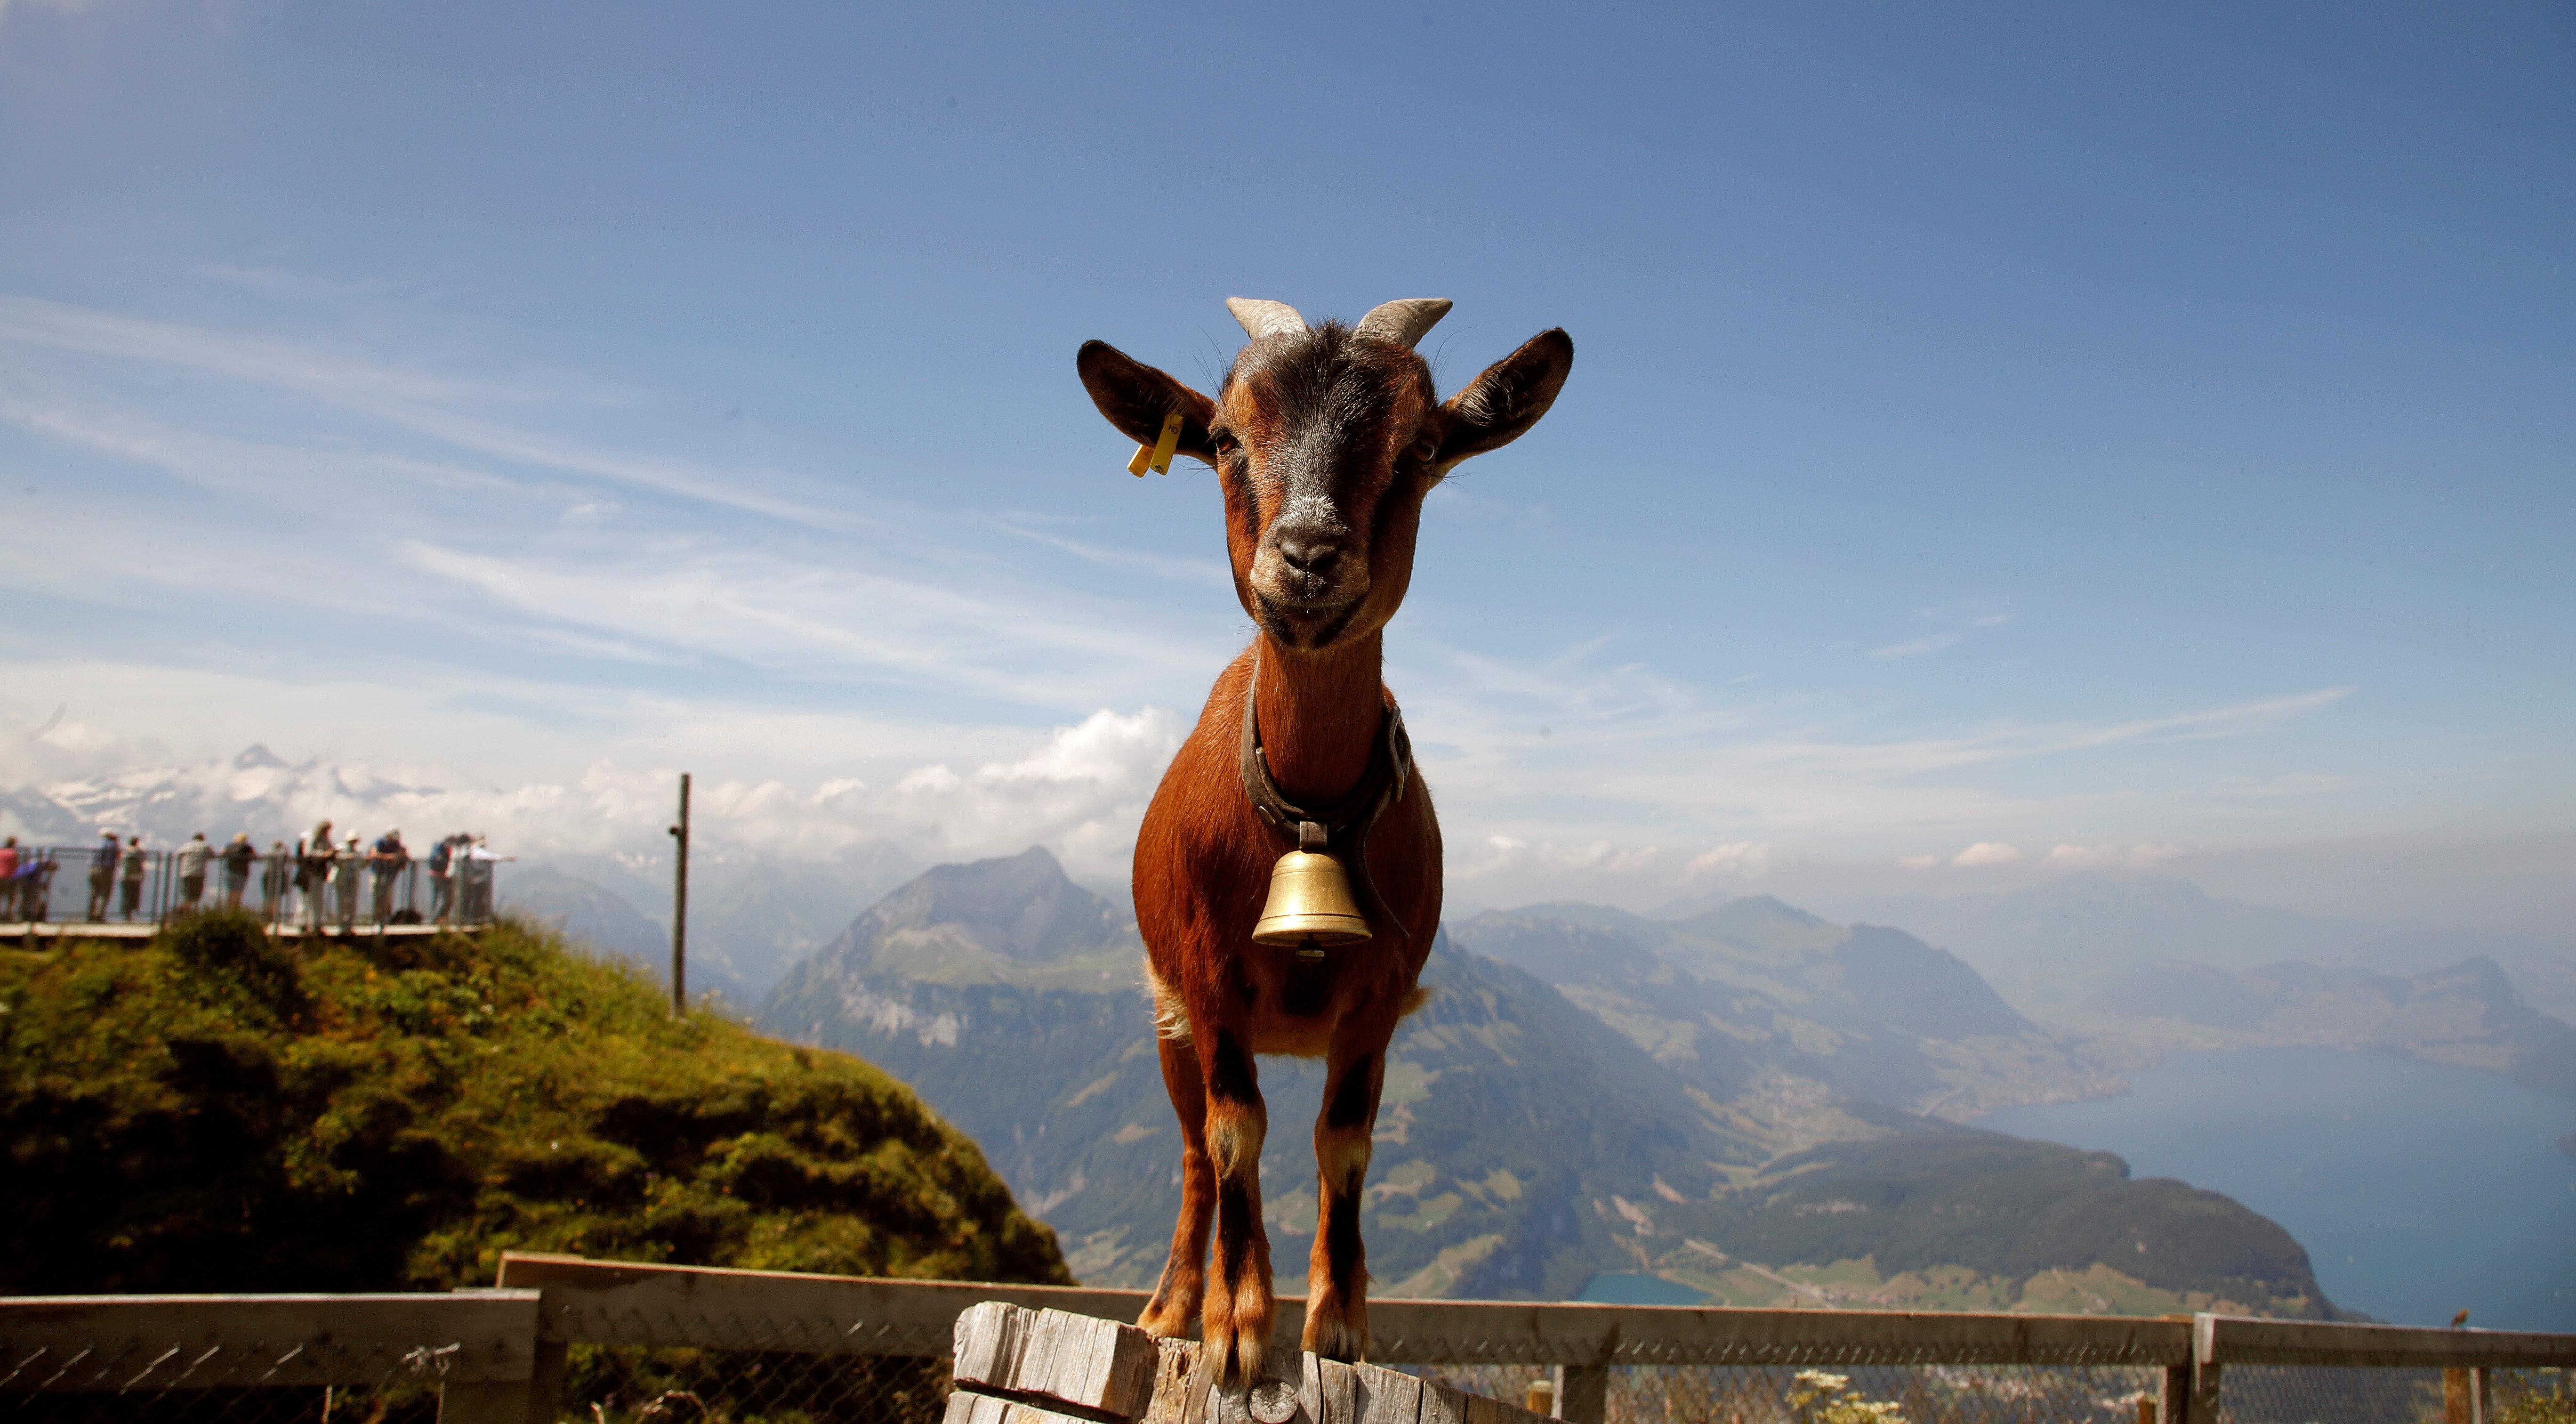 Who let the goats out? Κοπάδι από κατσίκες ξεχύθηκε στους δρόμους του Άινταχο τρελαίνοντας τα social